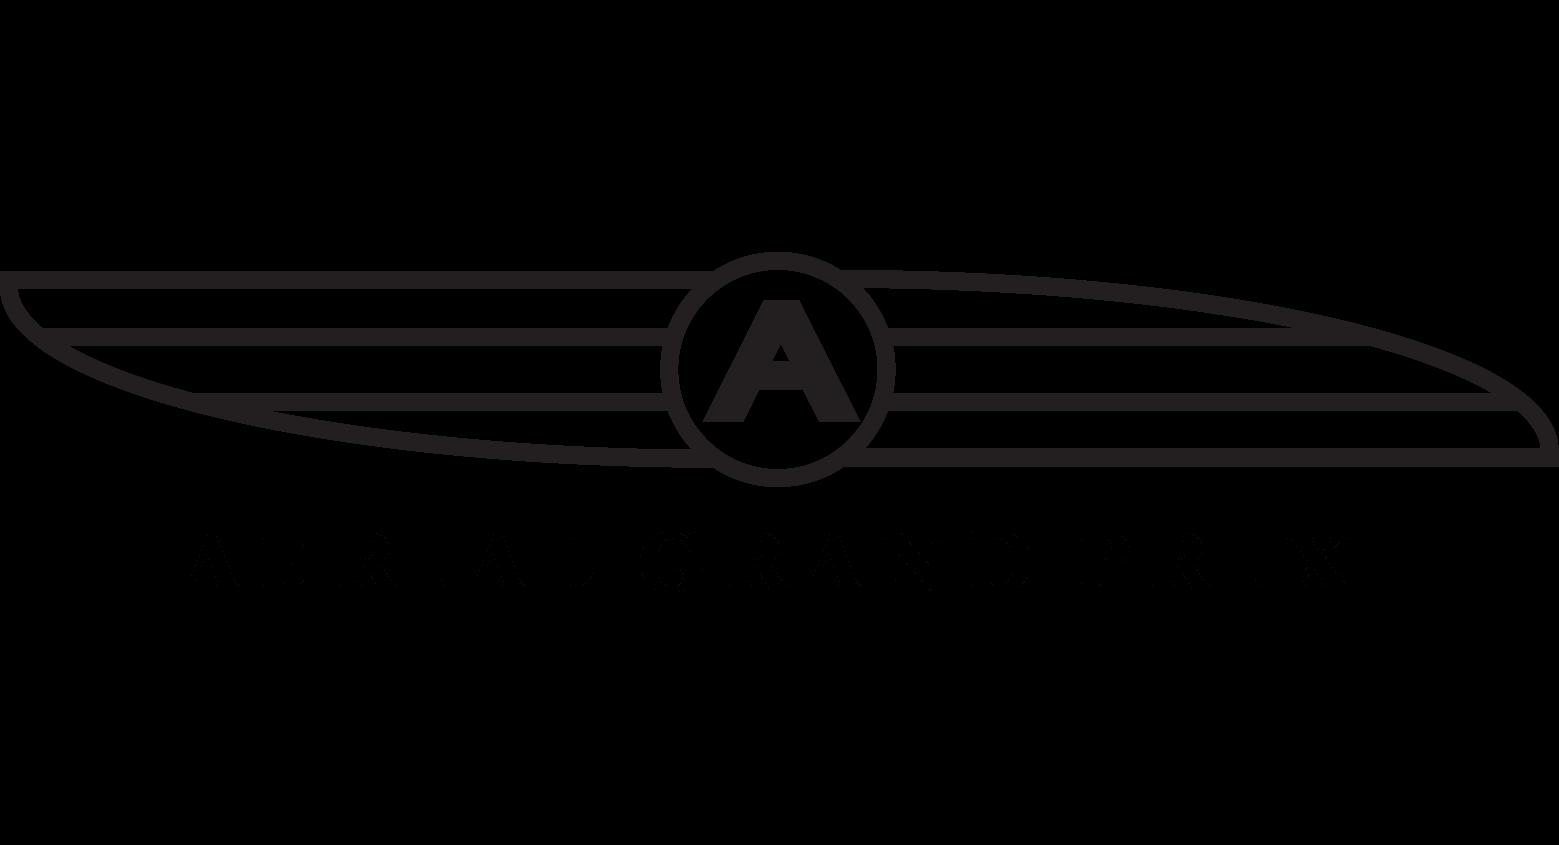 aerial grand prix